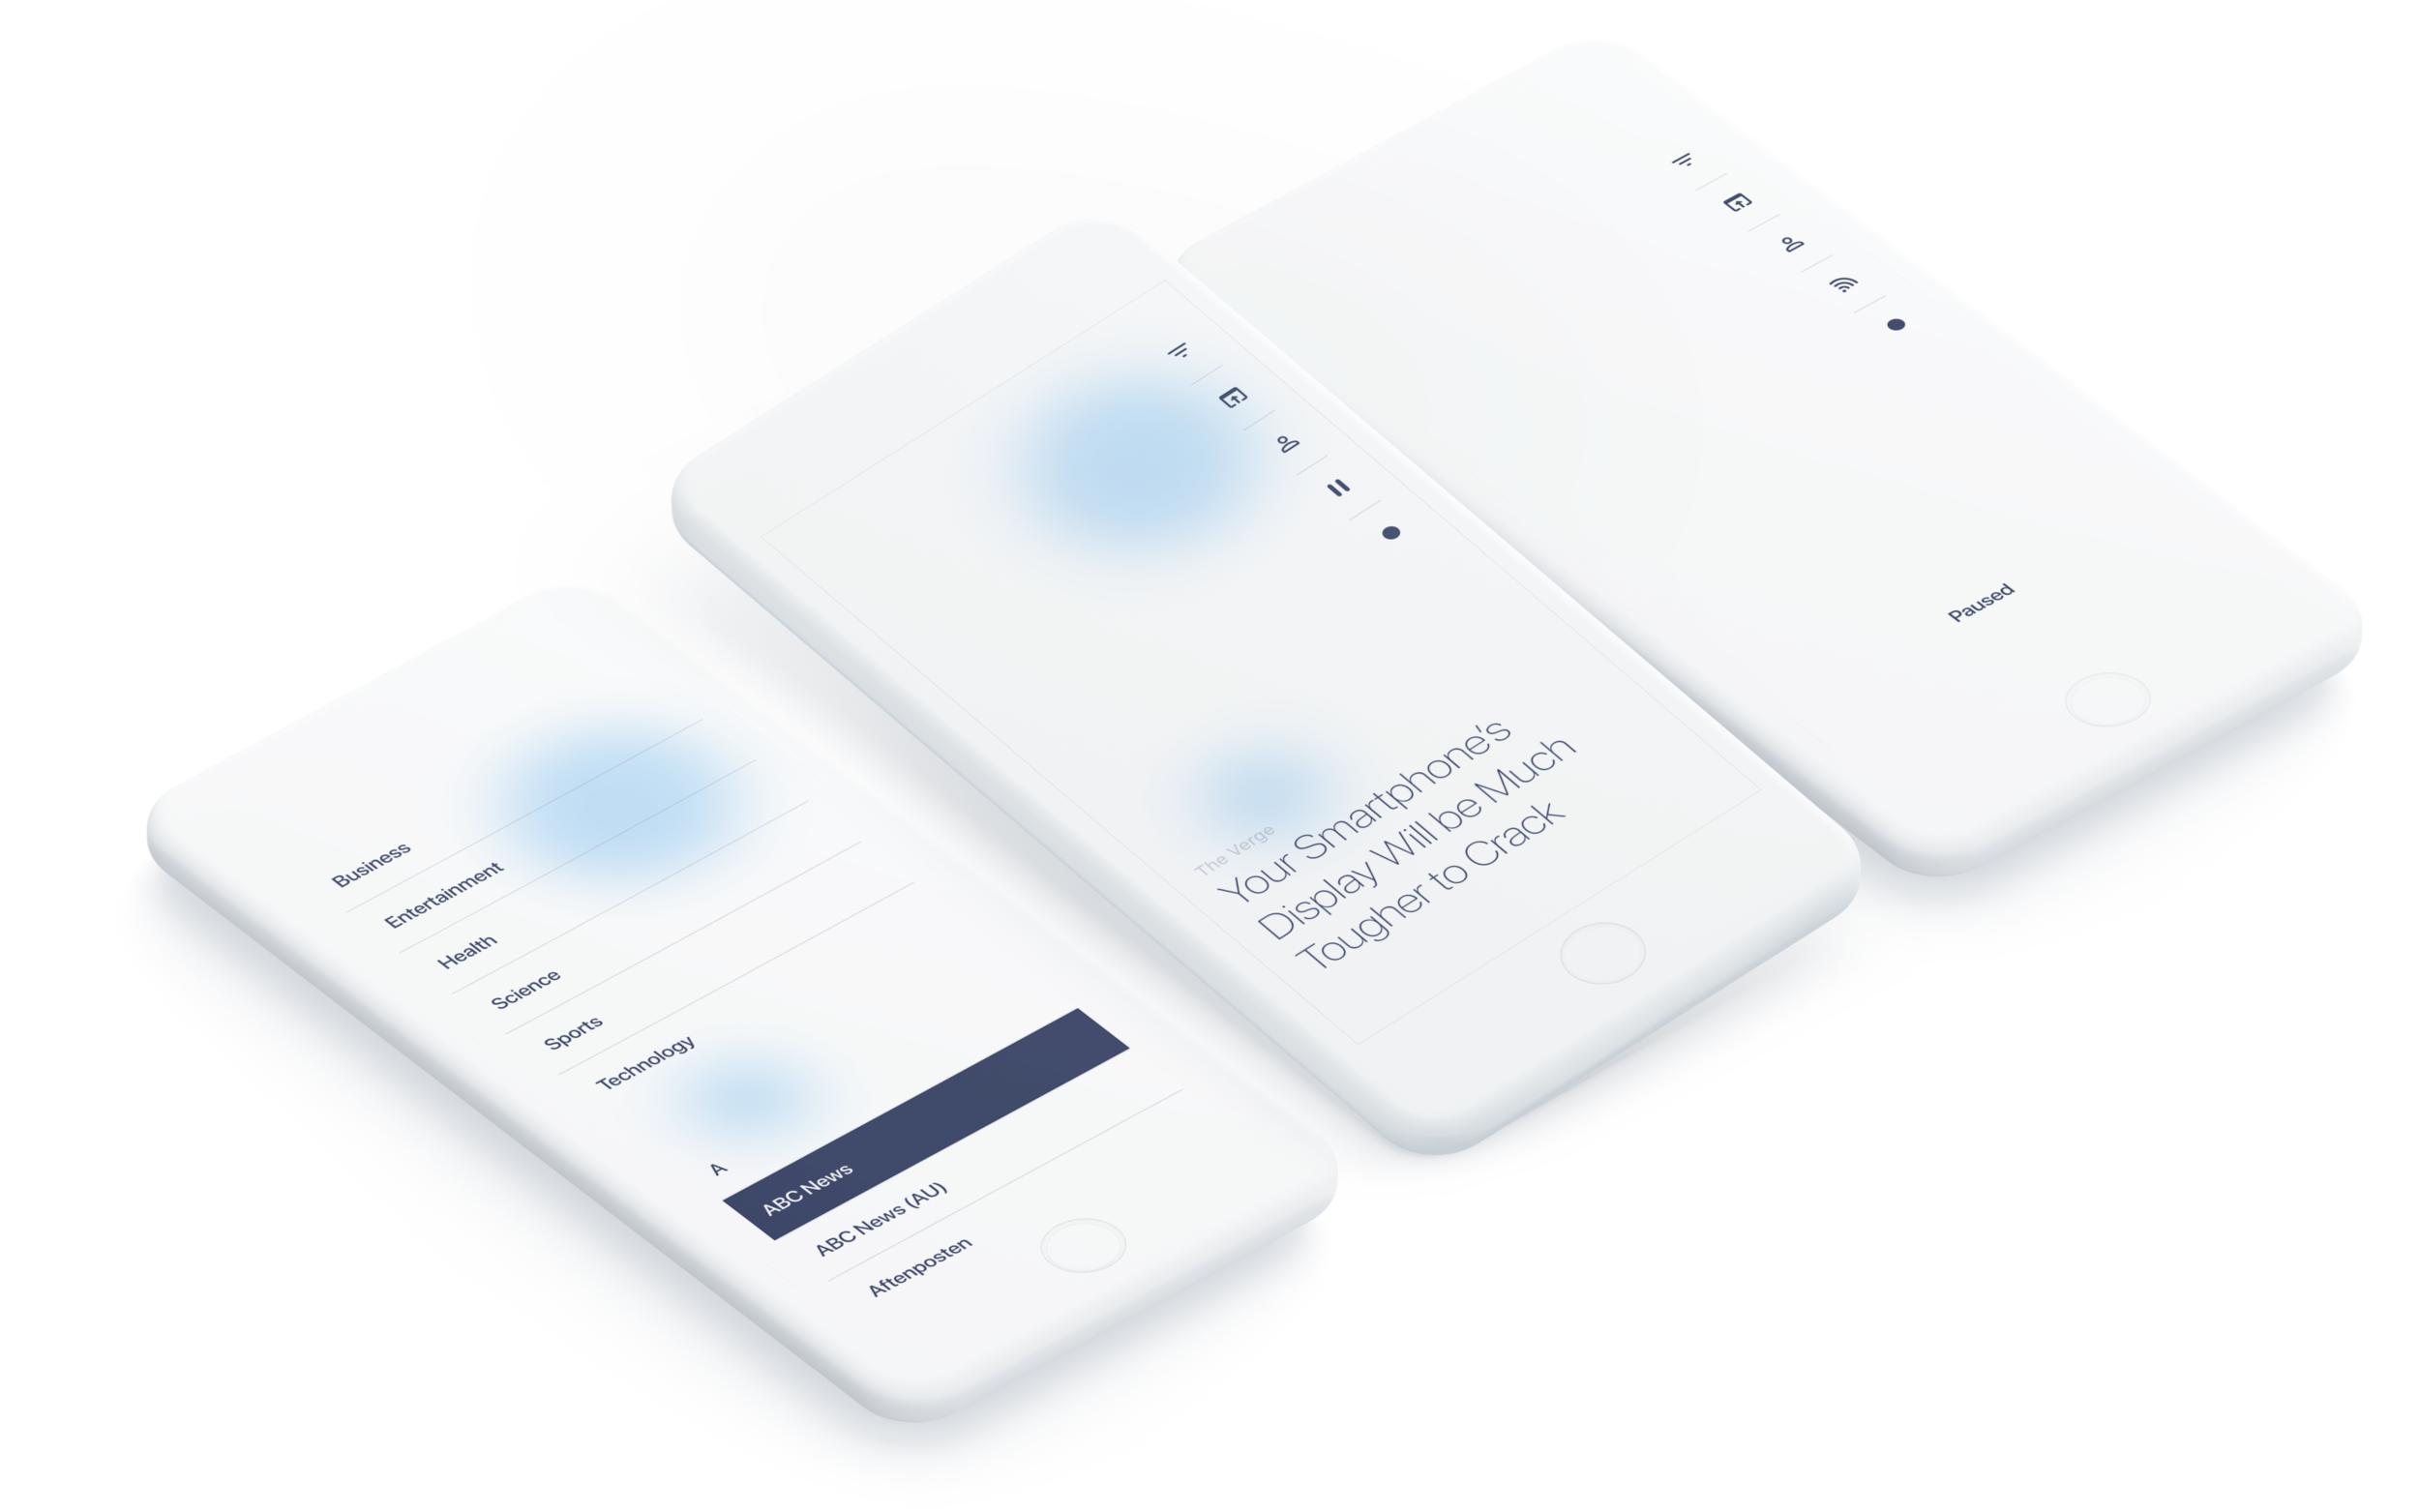 audiosume - interaction design - UI elements clear distinction@2x.png